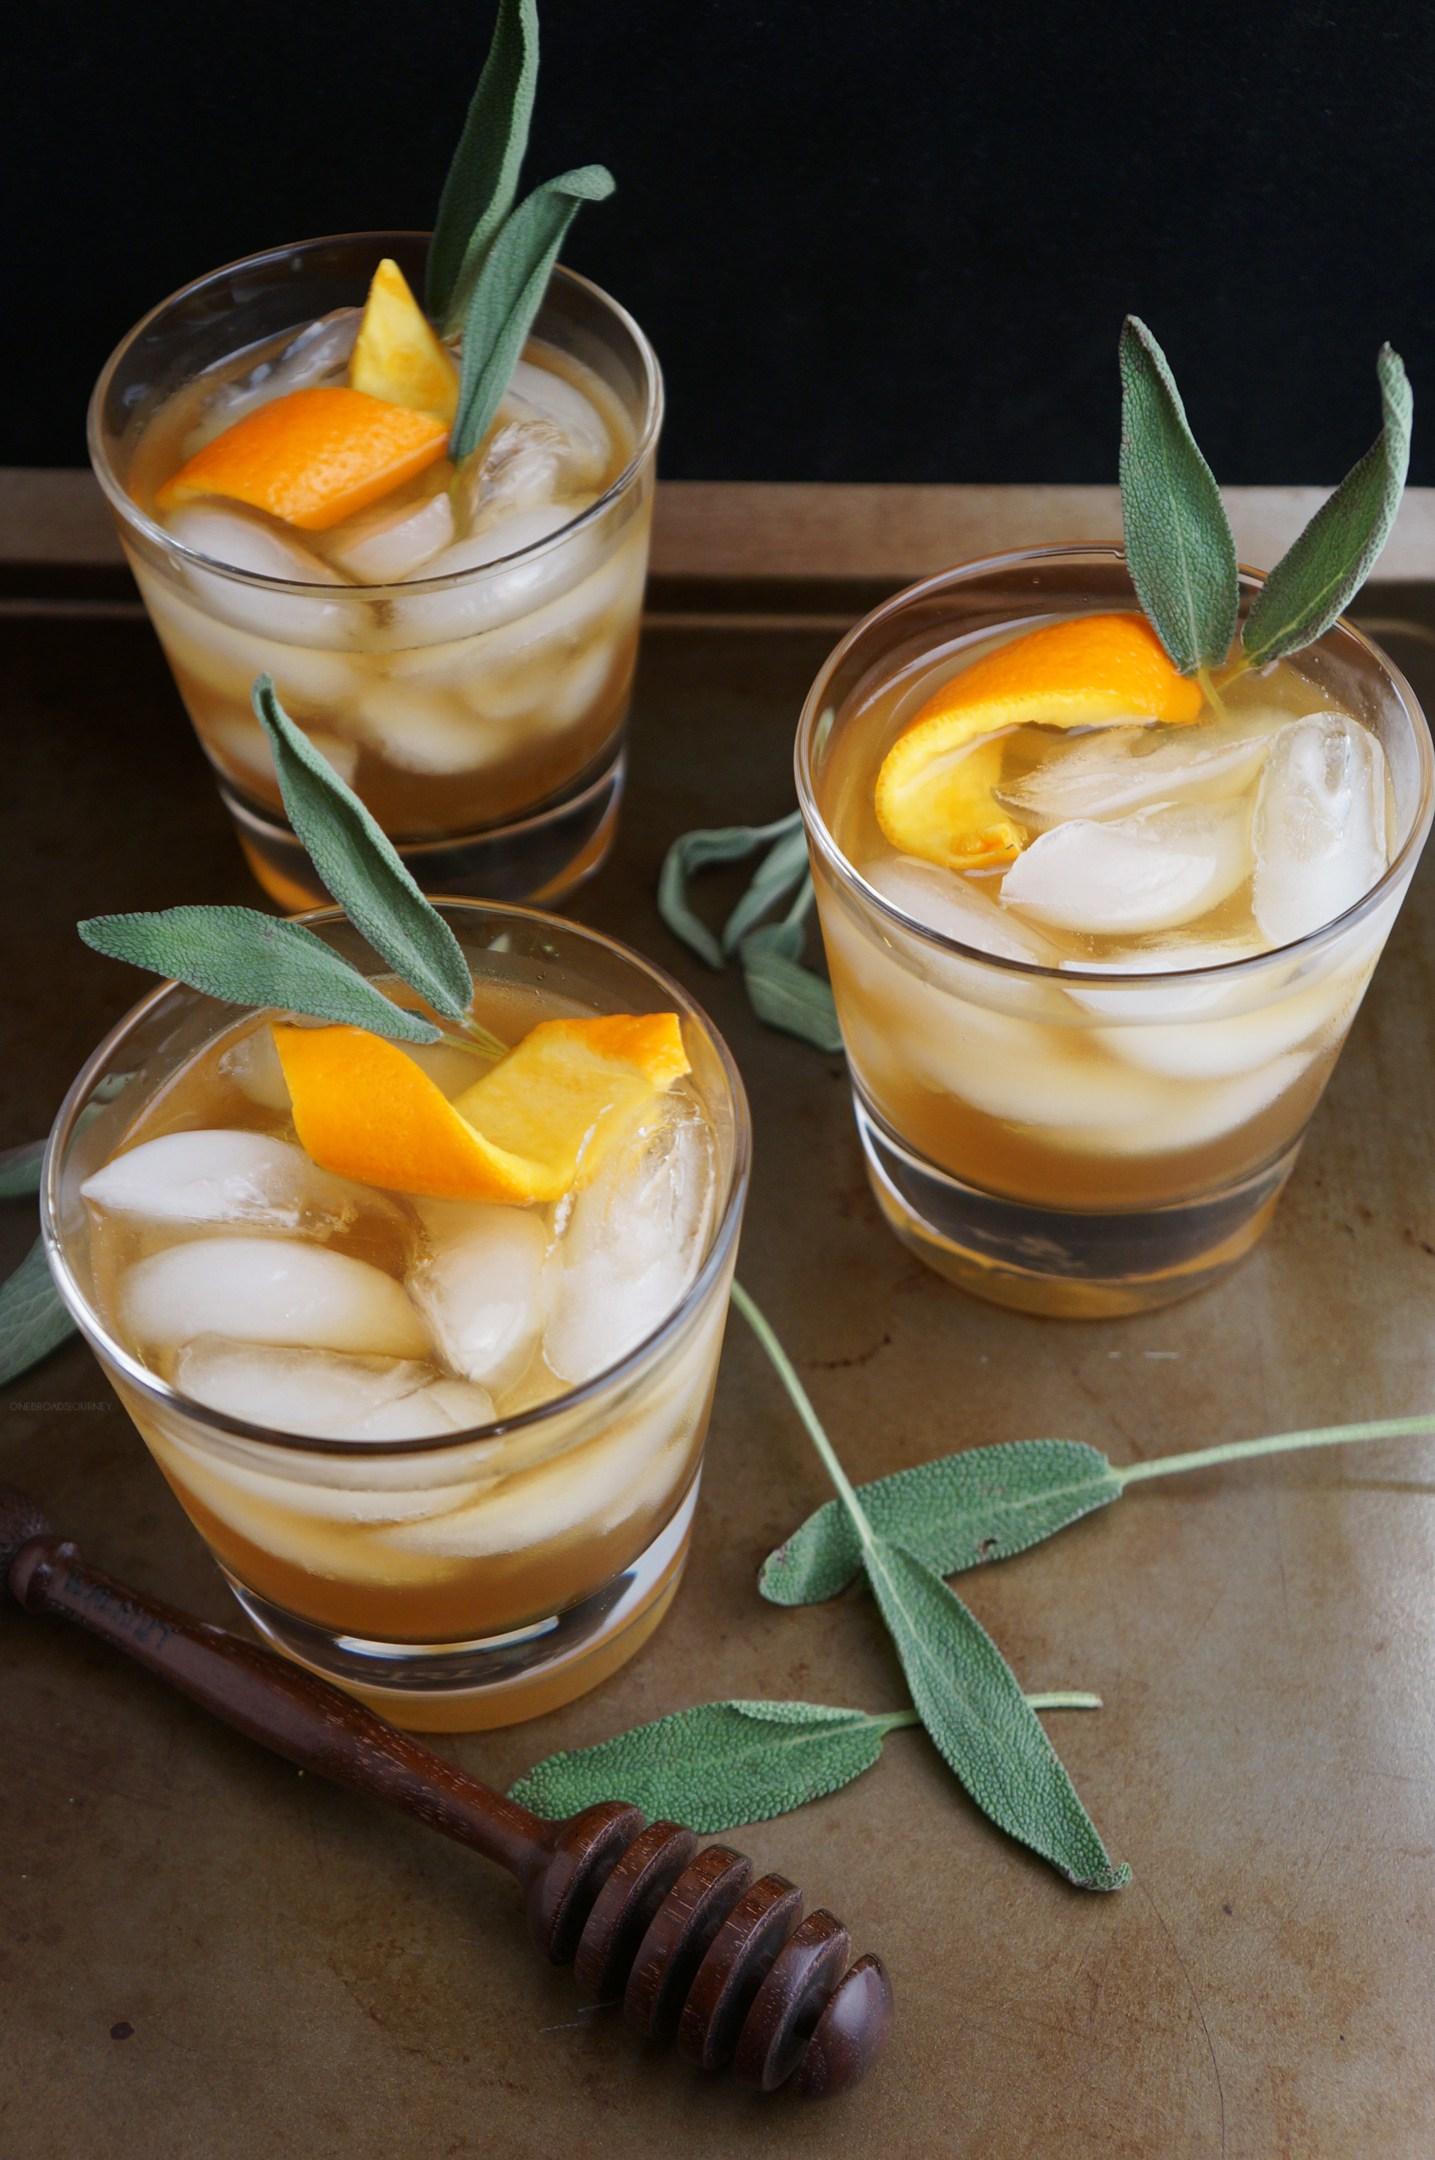 honey-winter-bourbon-cocktail-one-broads-journey